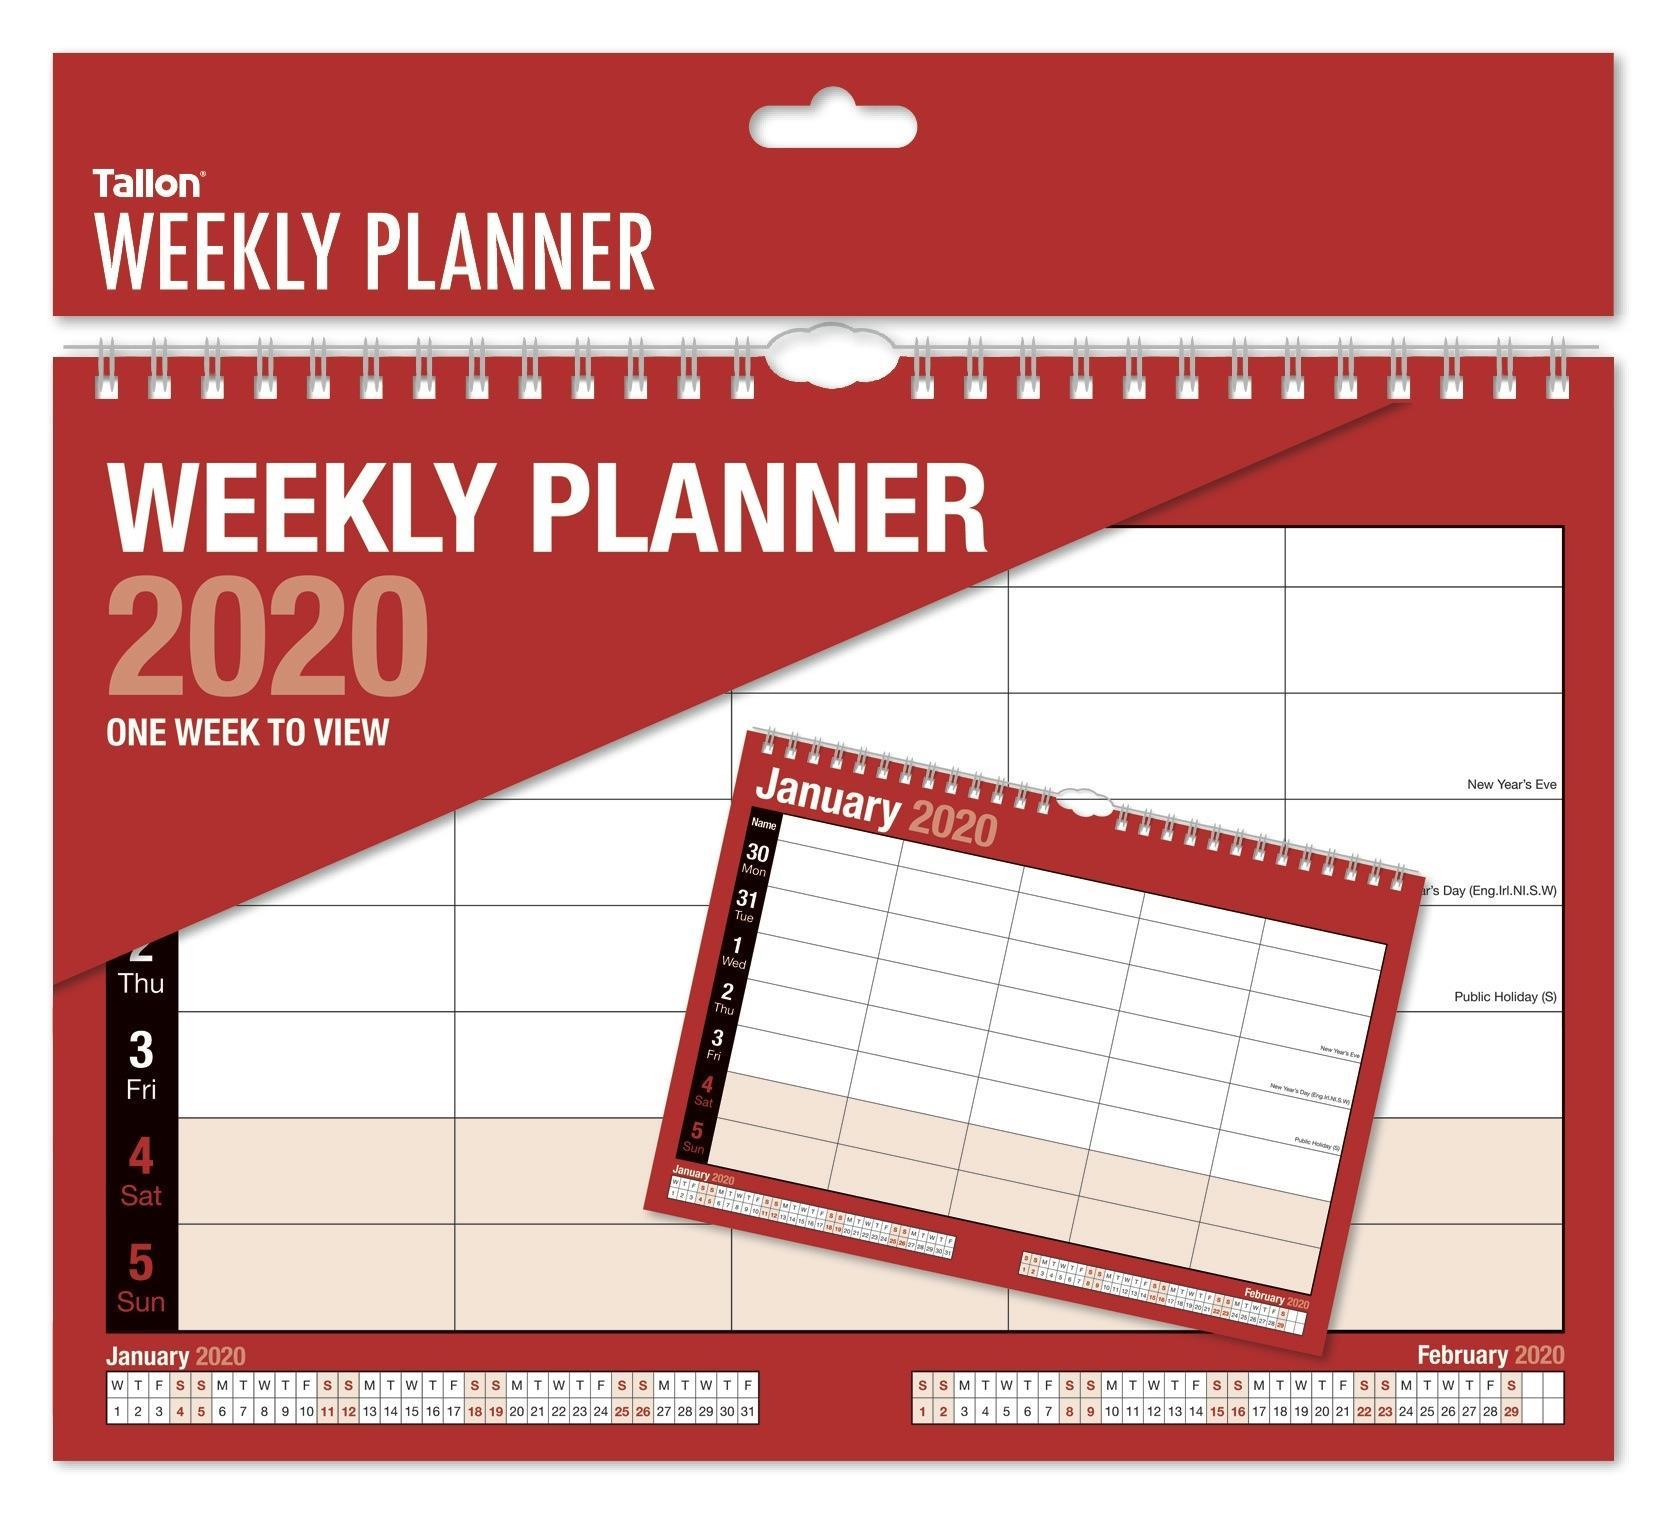 Details About 2020 Weekly Planner Calendar One Week To View Spiral Bound  Organiser 5 Column